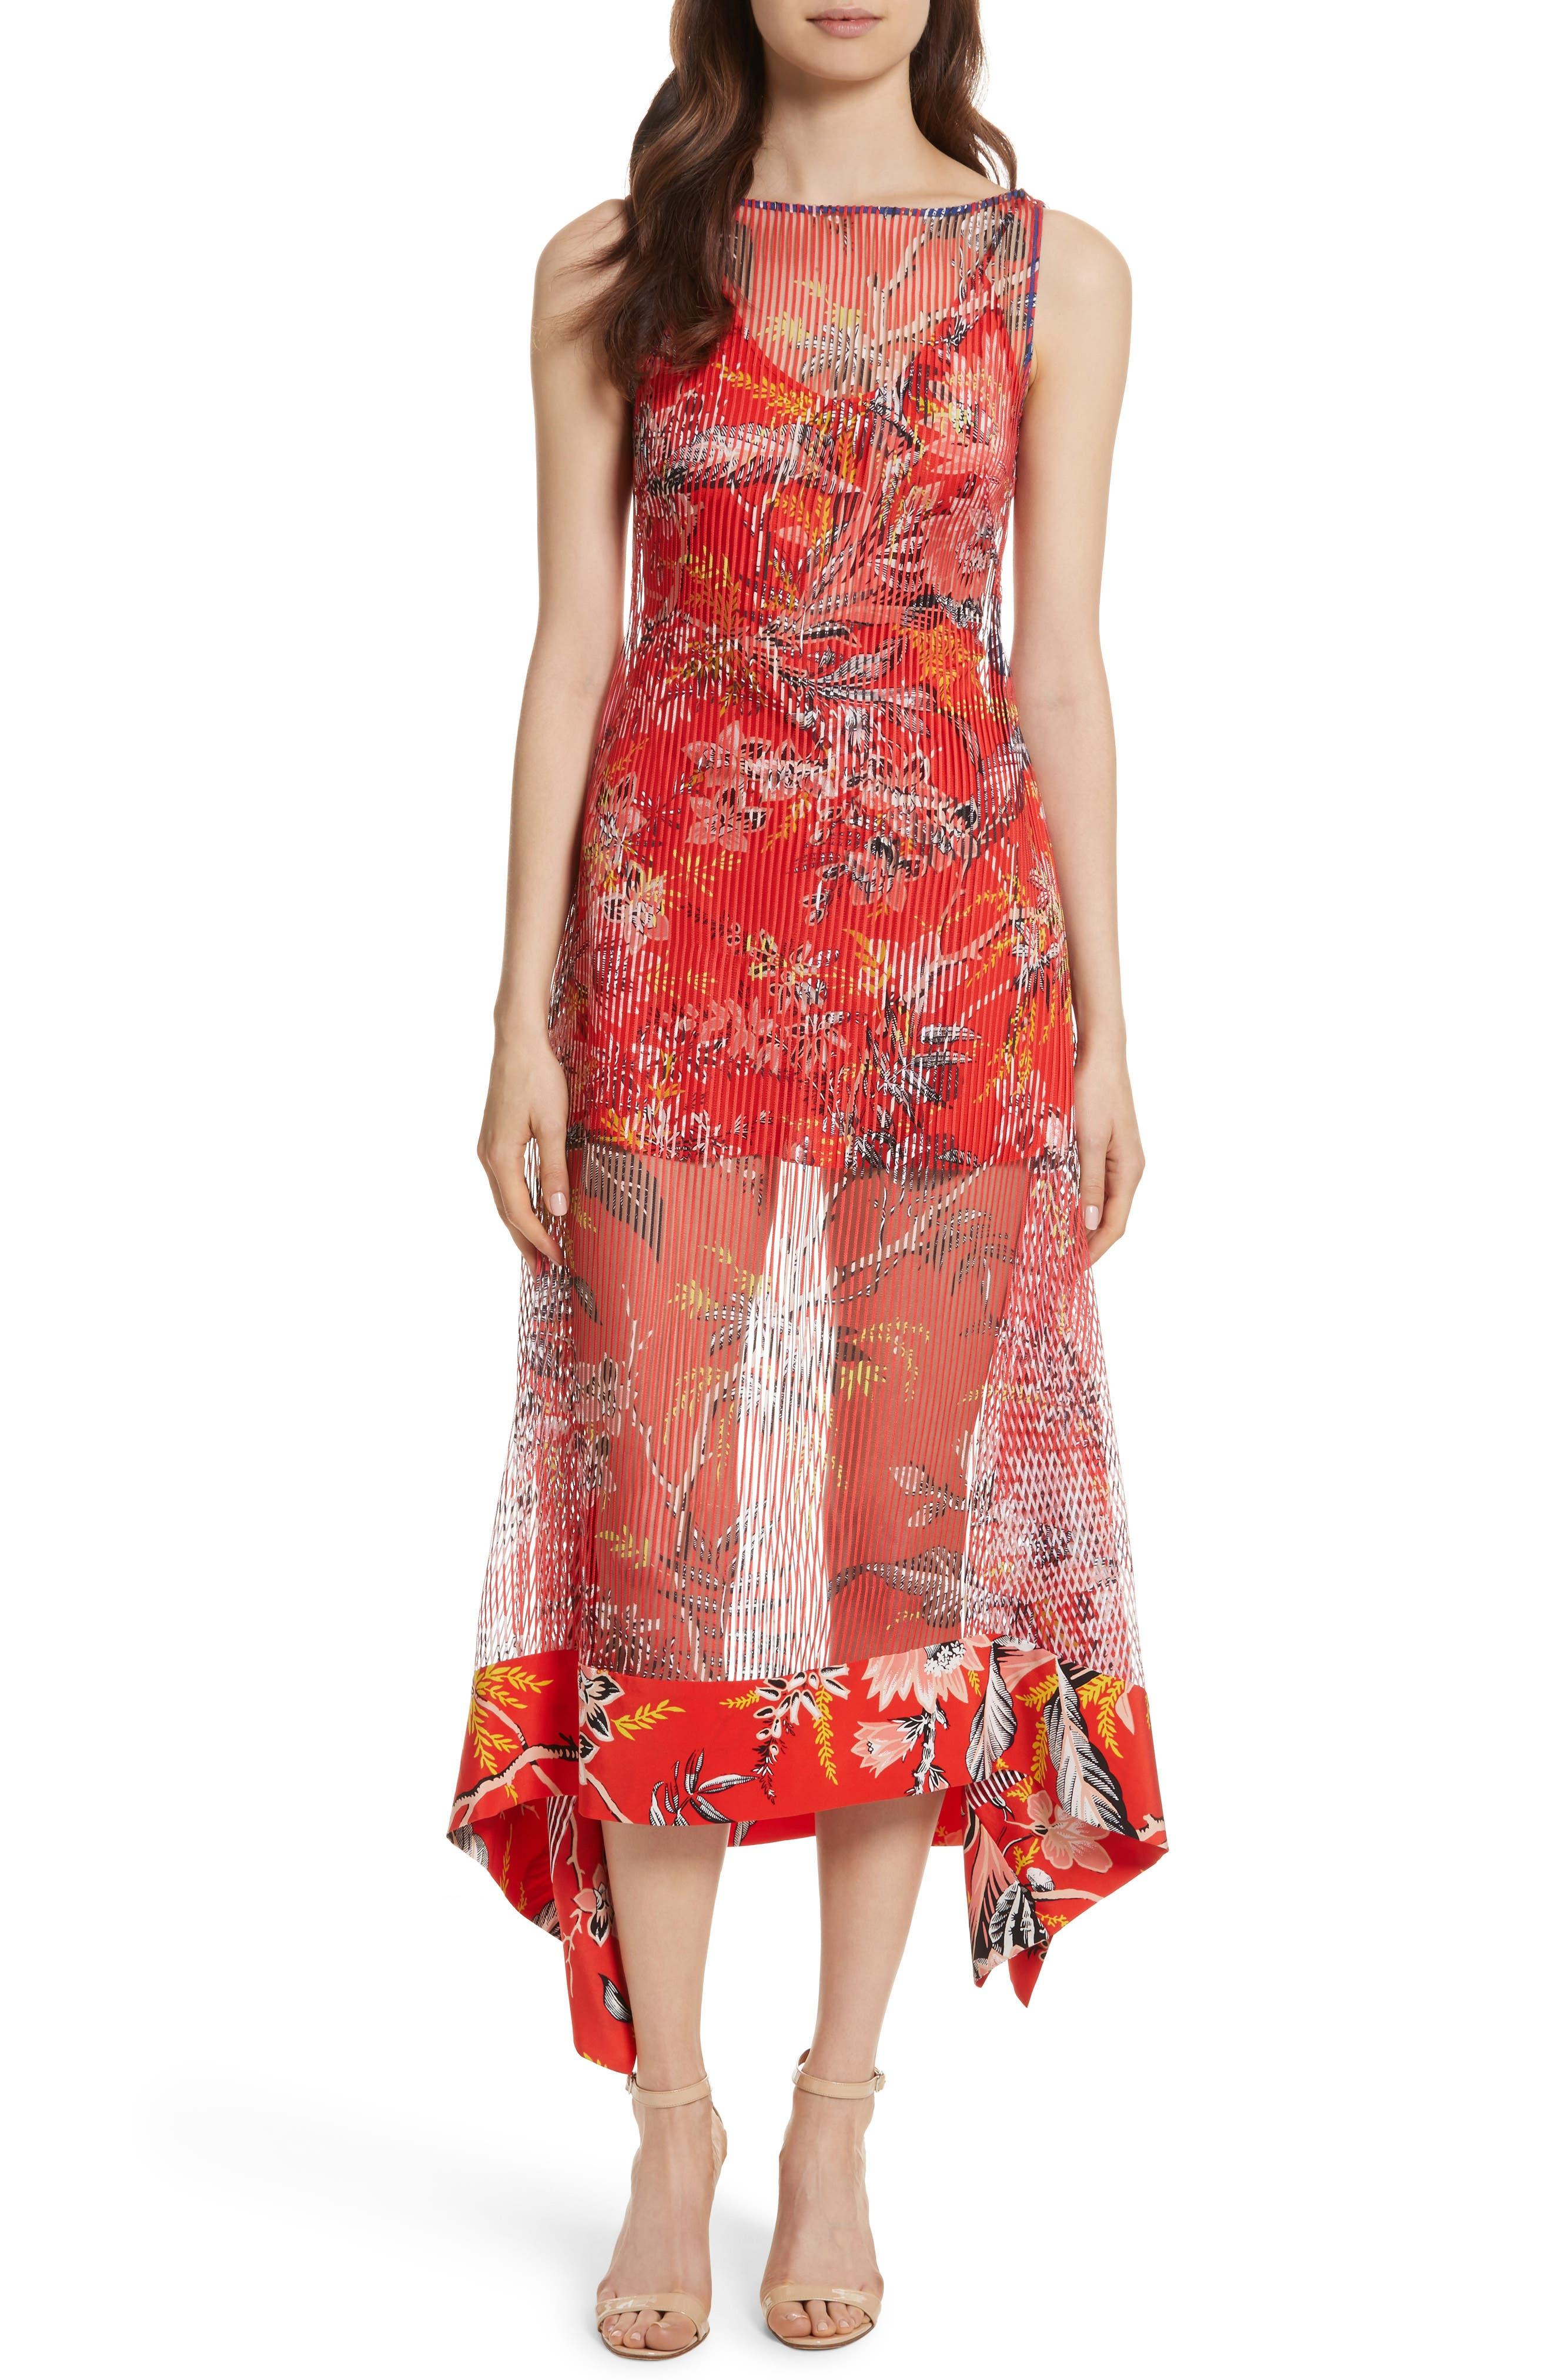 Alternate Image 1 Selected - Diane von Furstenberg Floral Boat Neck Chiffon Midi Dress